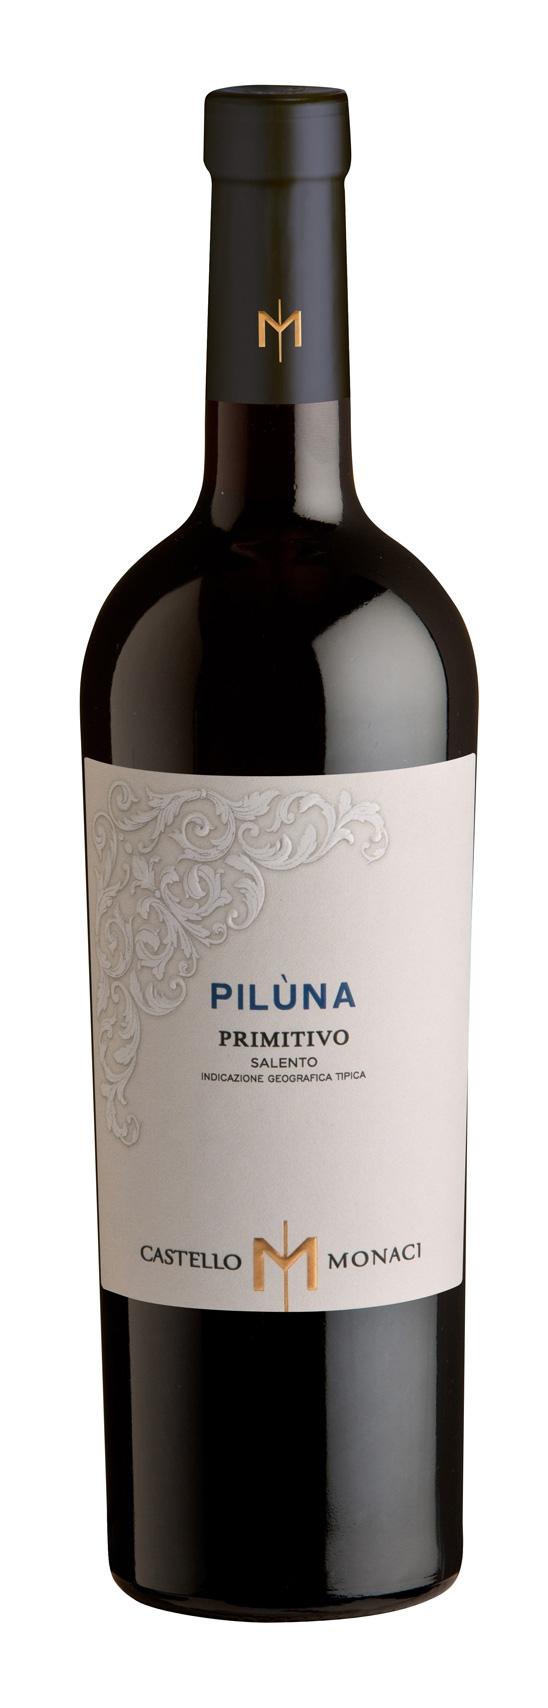 Piluna Primitivo Salento 2019